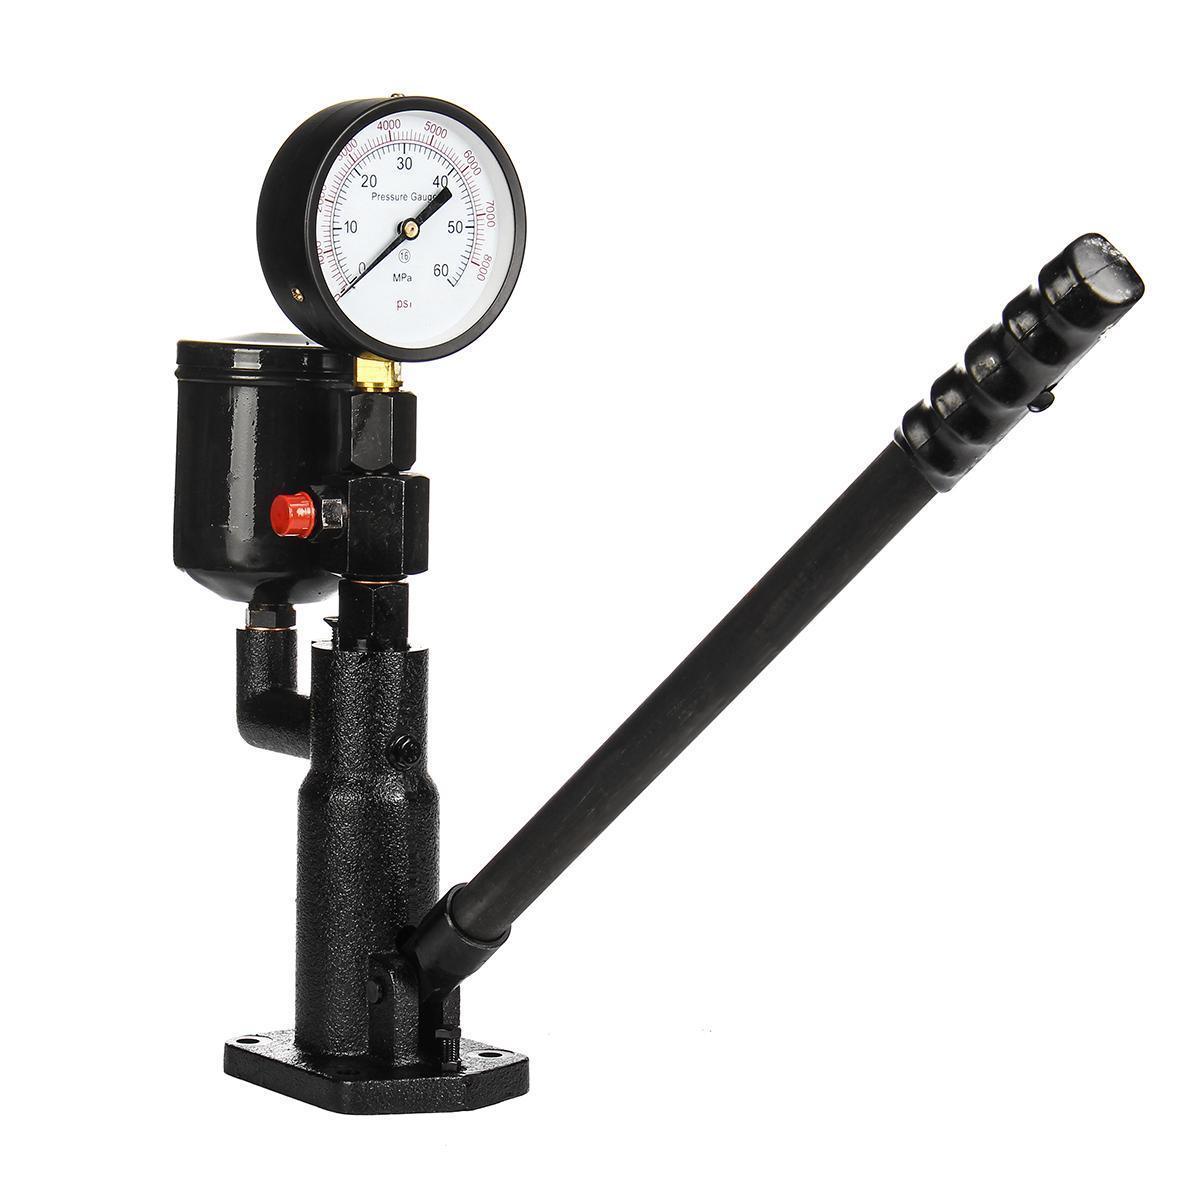 Pop Diesel Injector Nozzle Pressure Tester Dual Scale Read Gauge Bar PSI  0-60Mpa